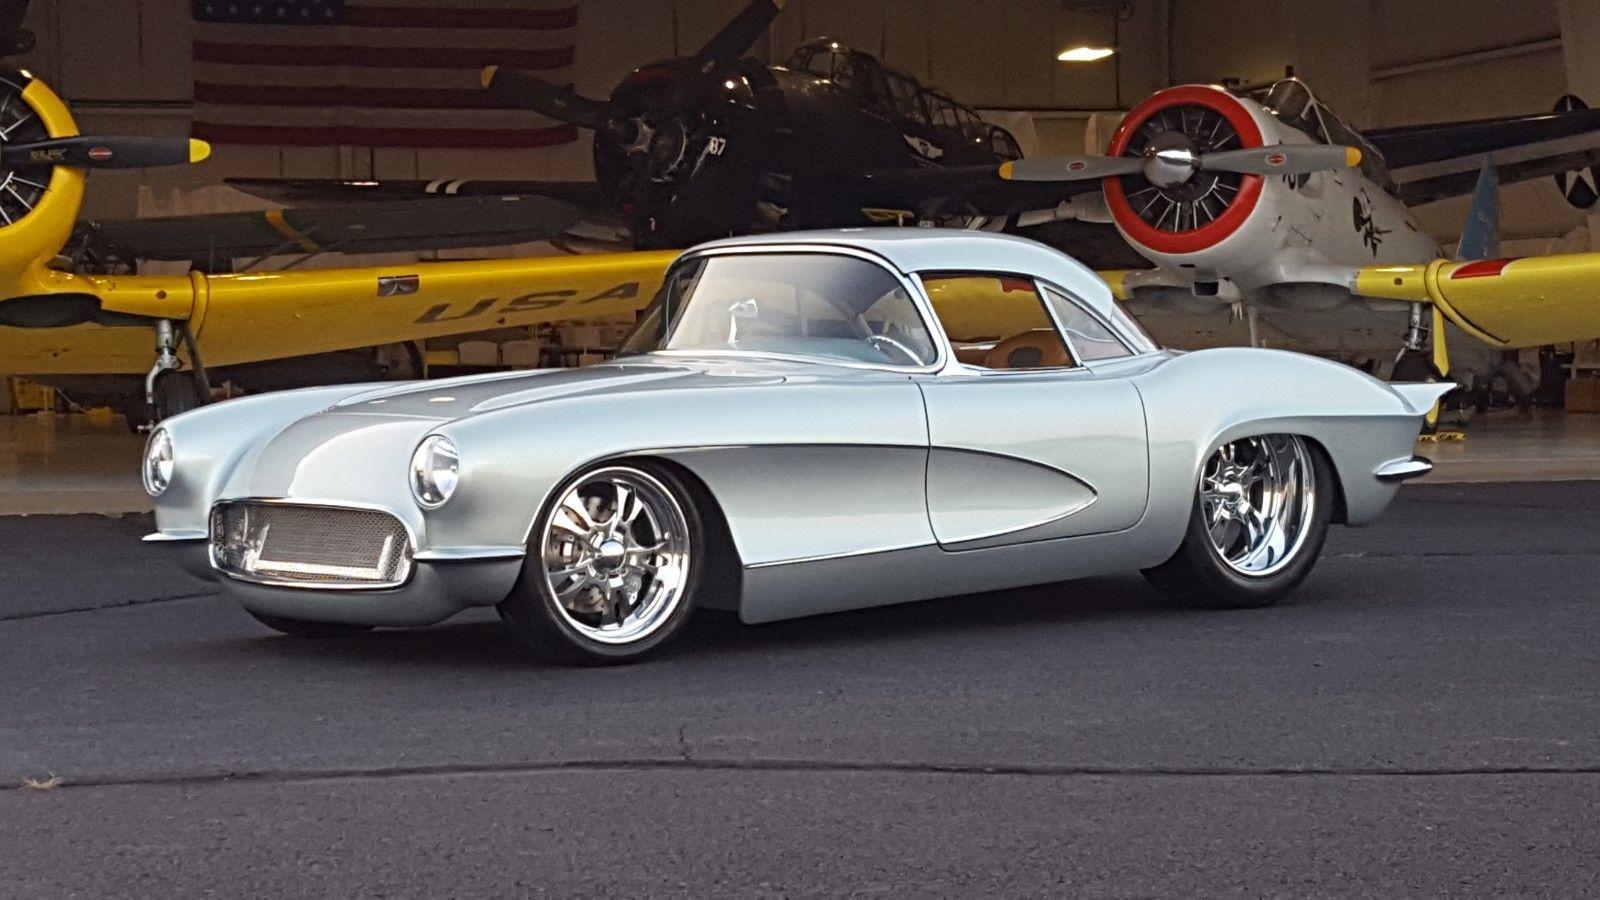 1962 Corvette with a 454 LSX V8